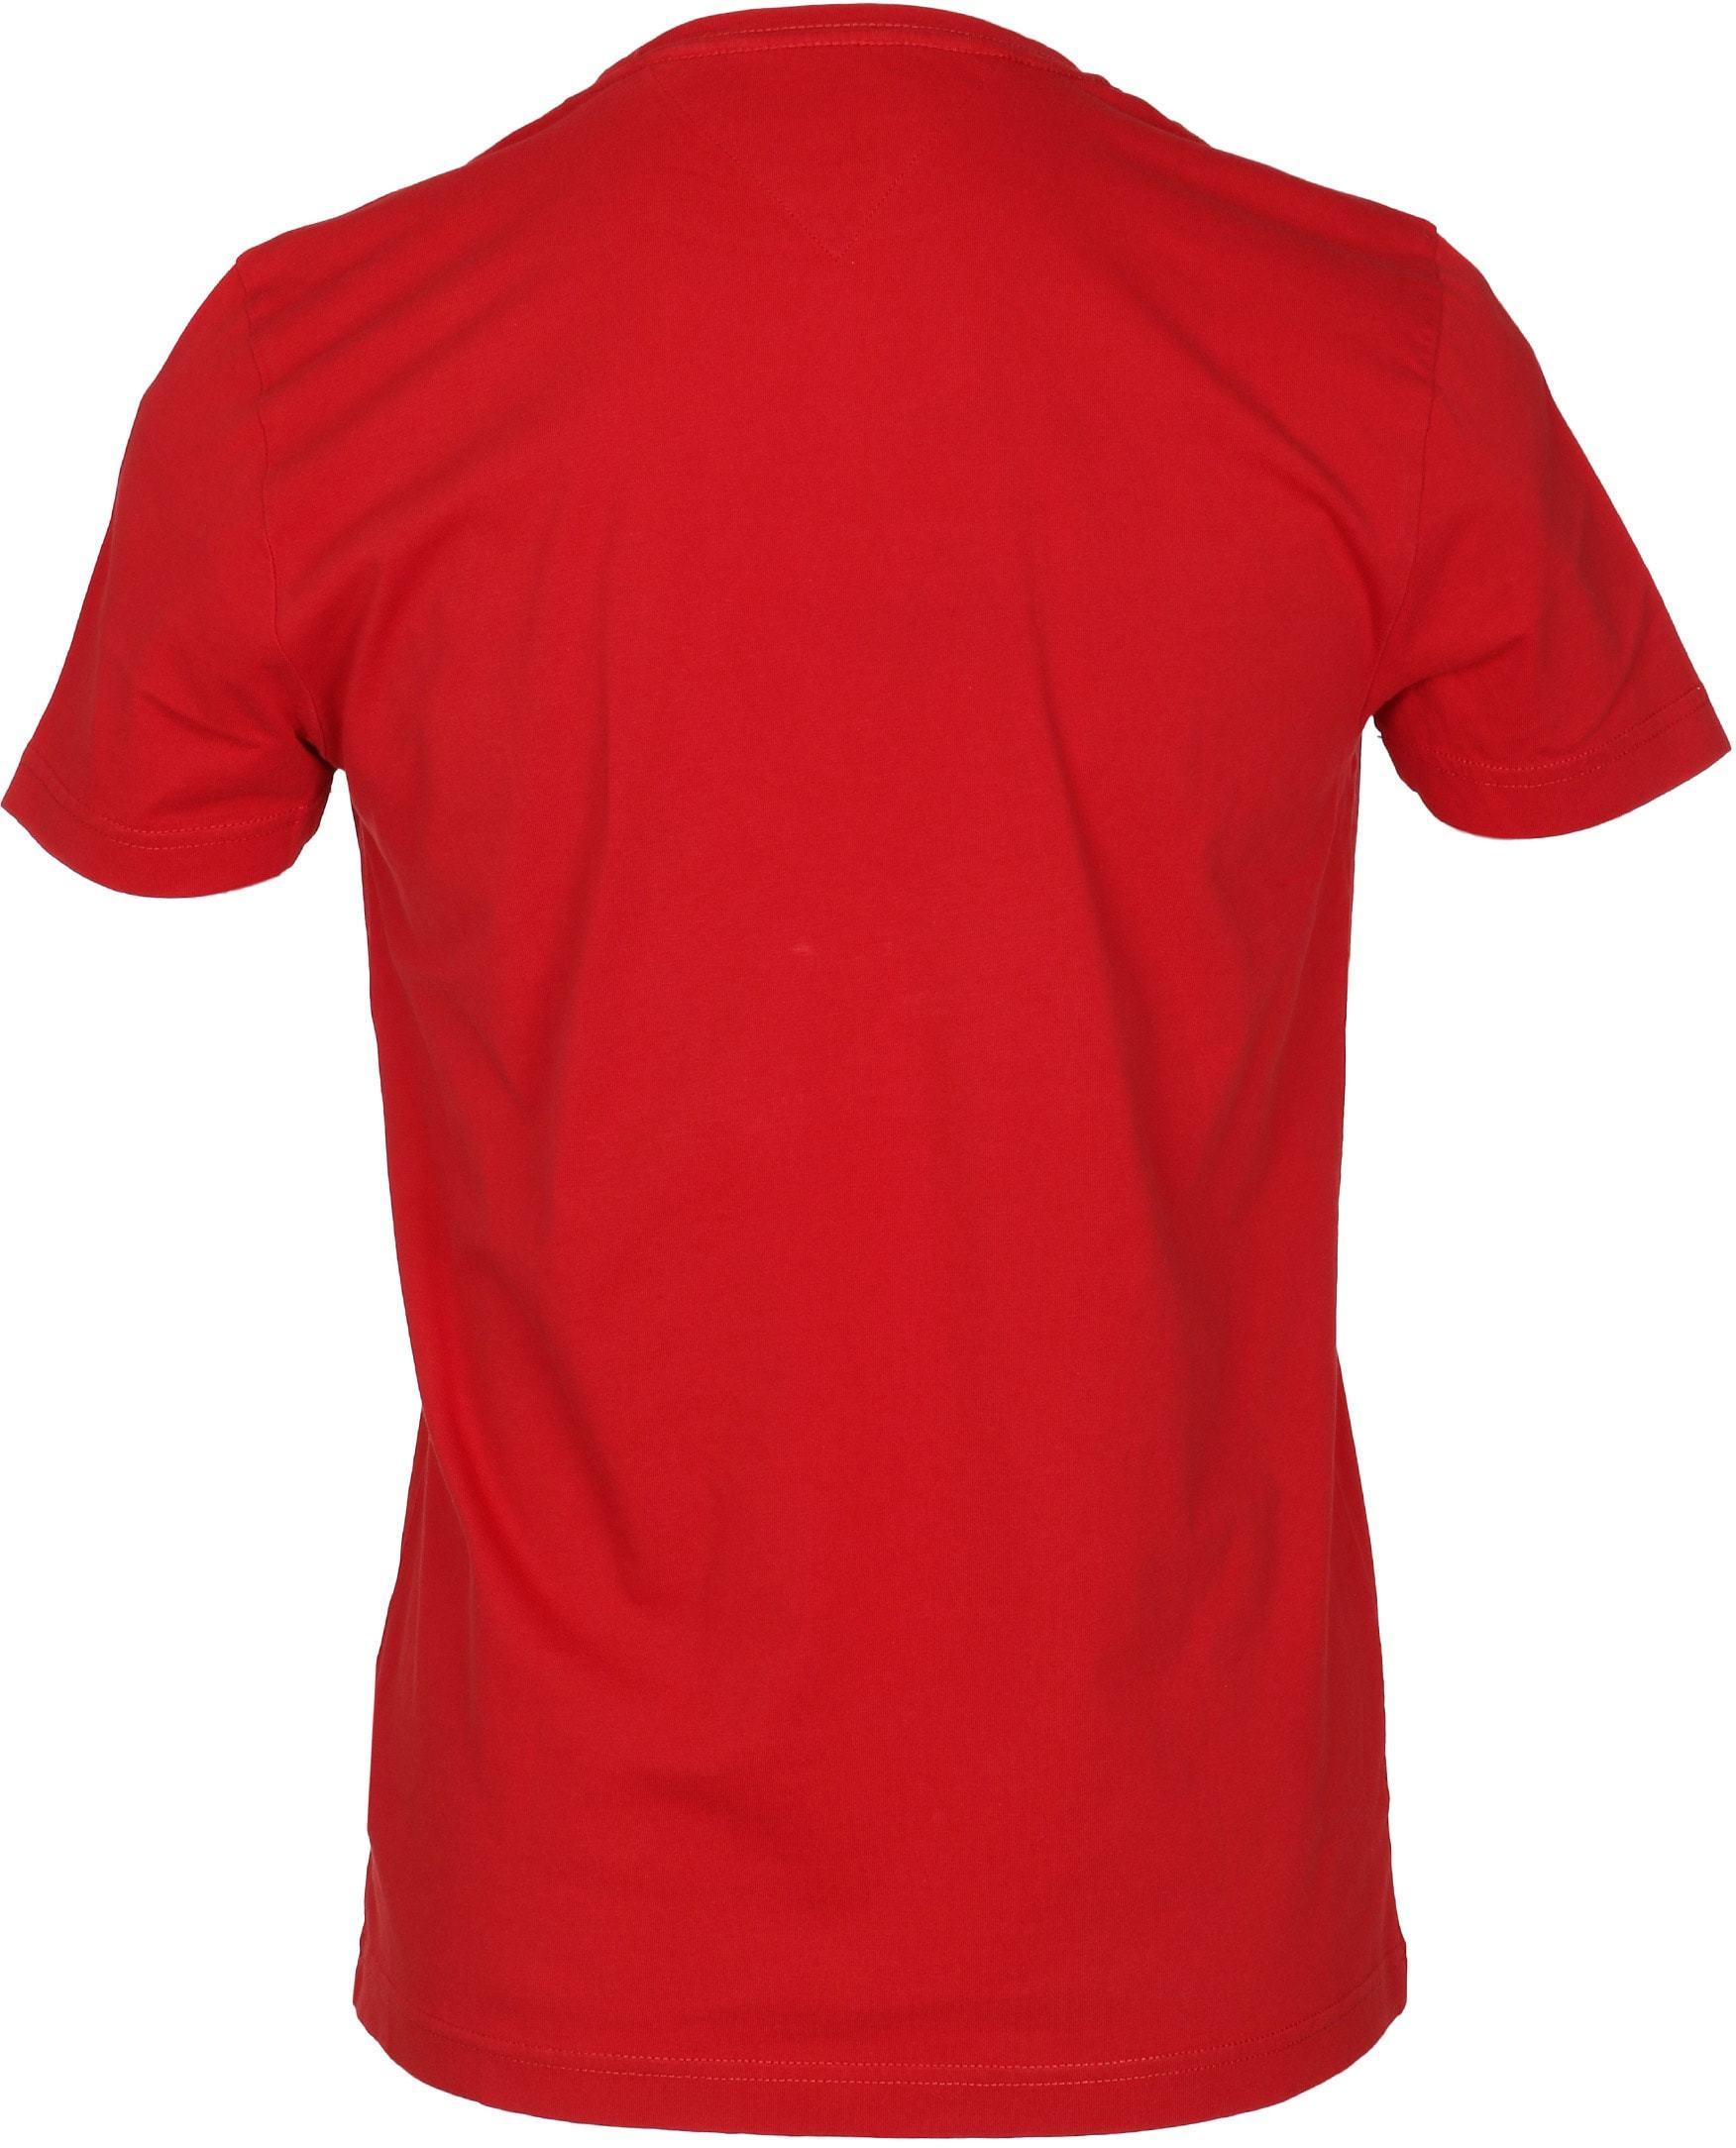 Tommy Hilfiger T-shirt TH Rot foto 3